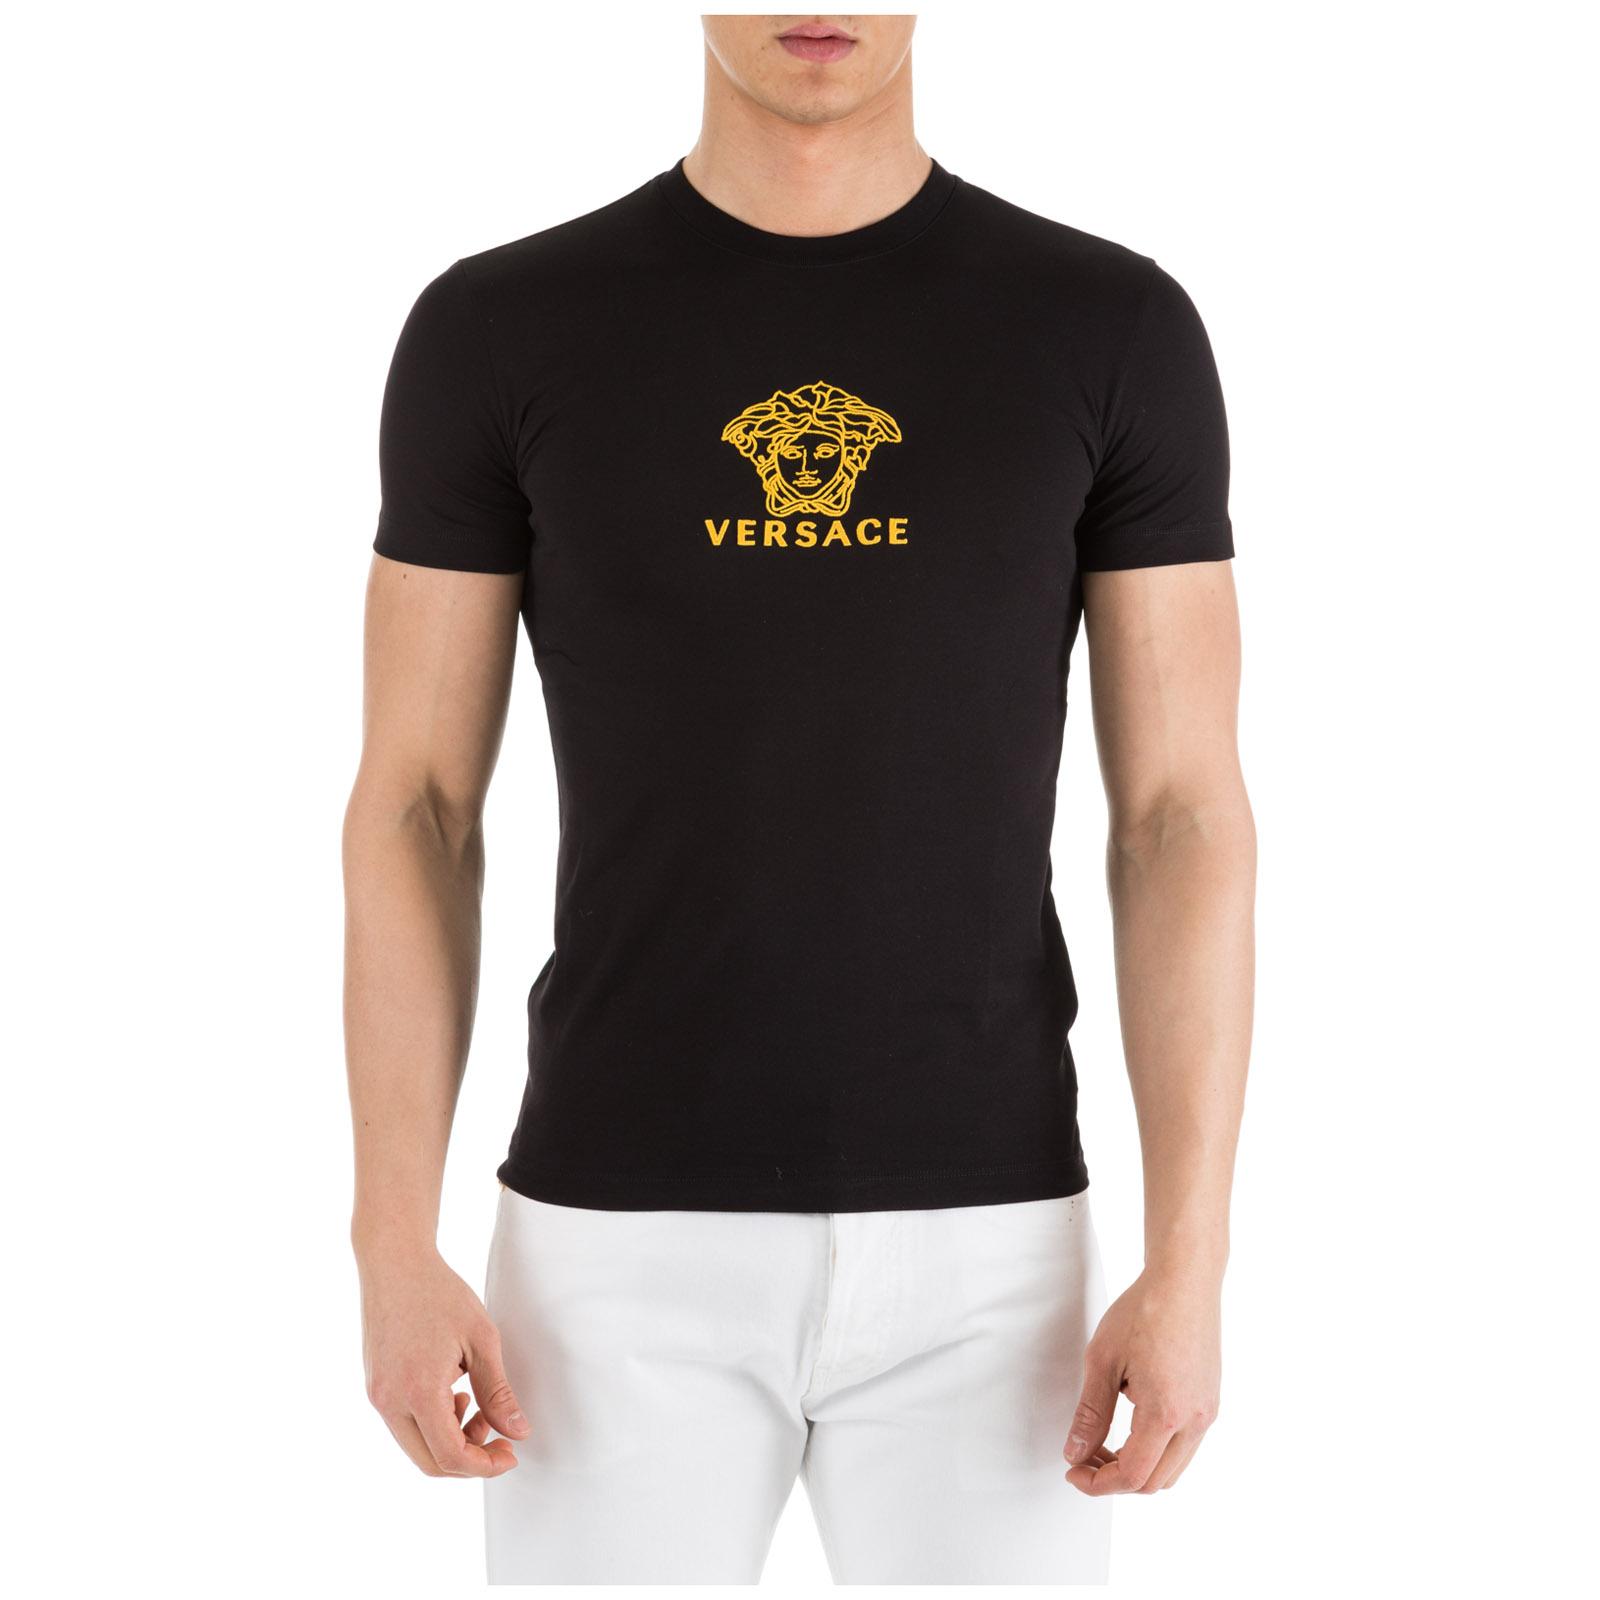 033a2859 Versace Men's Short Sleeve T-Shirt Crew Neckline Jumper In Black ...